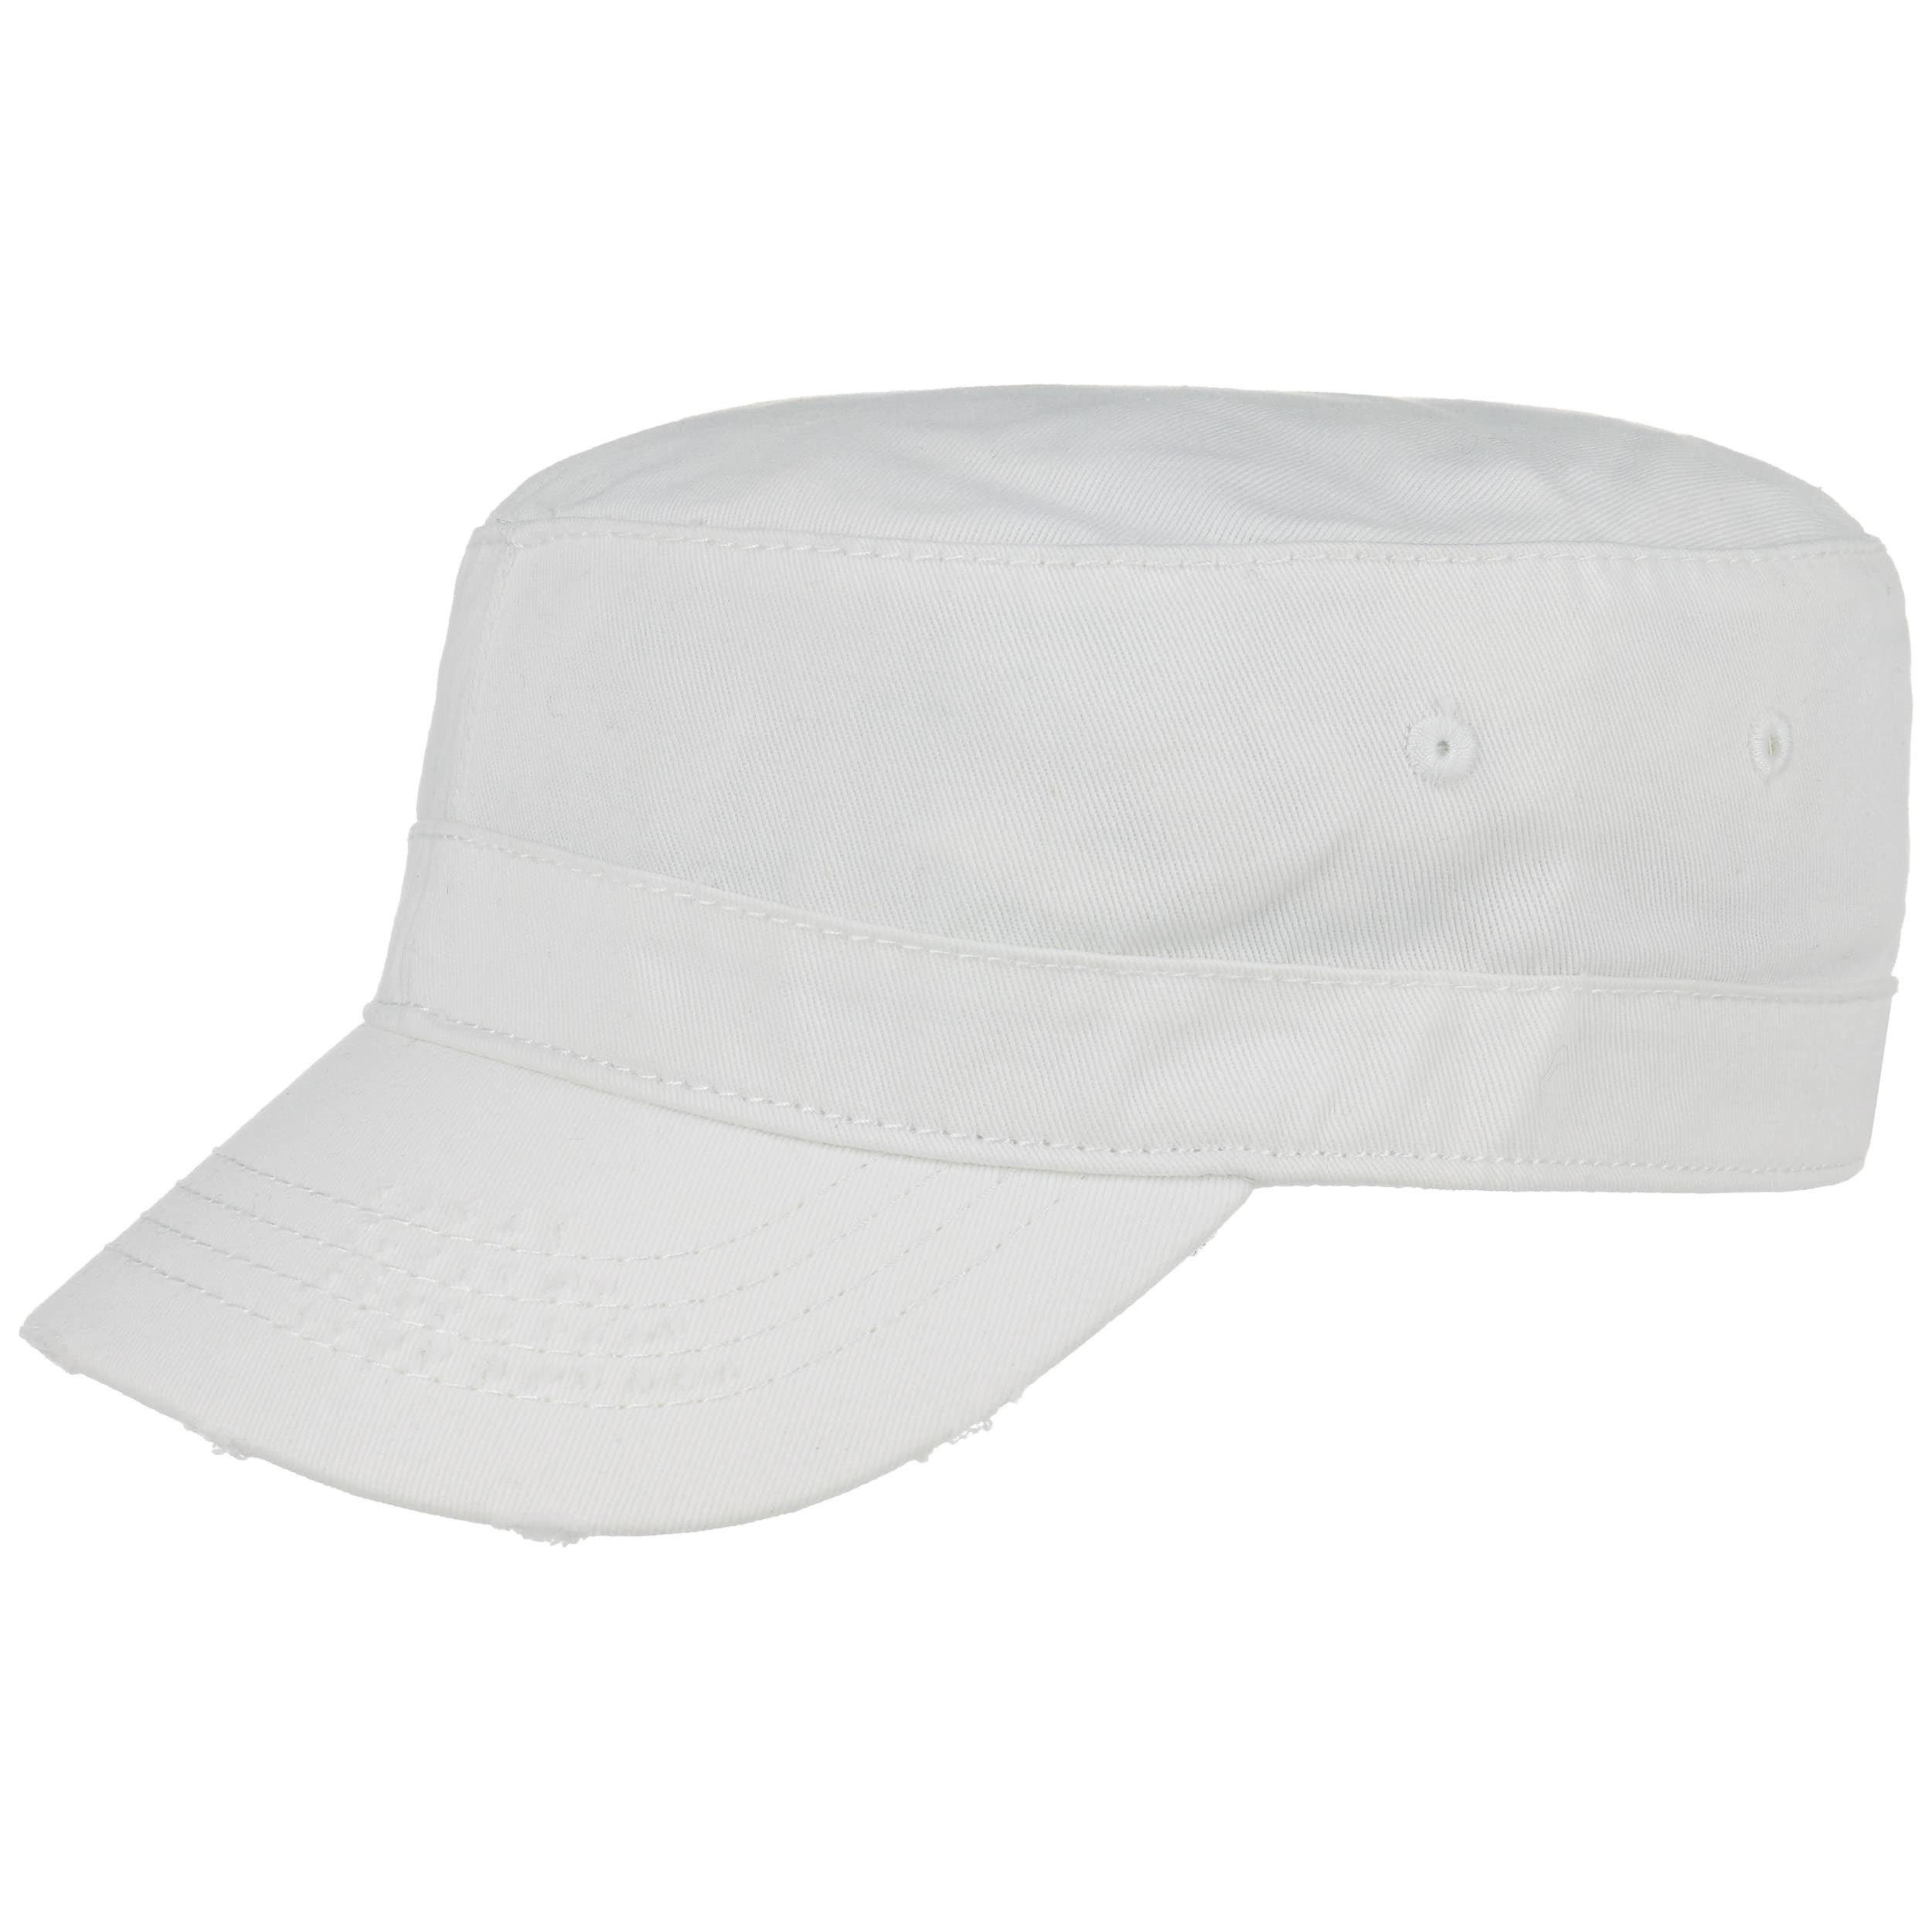 Urban Army Destroyed Cap Eur 12 95 Gt Hats Caps